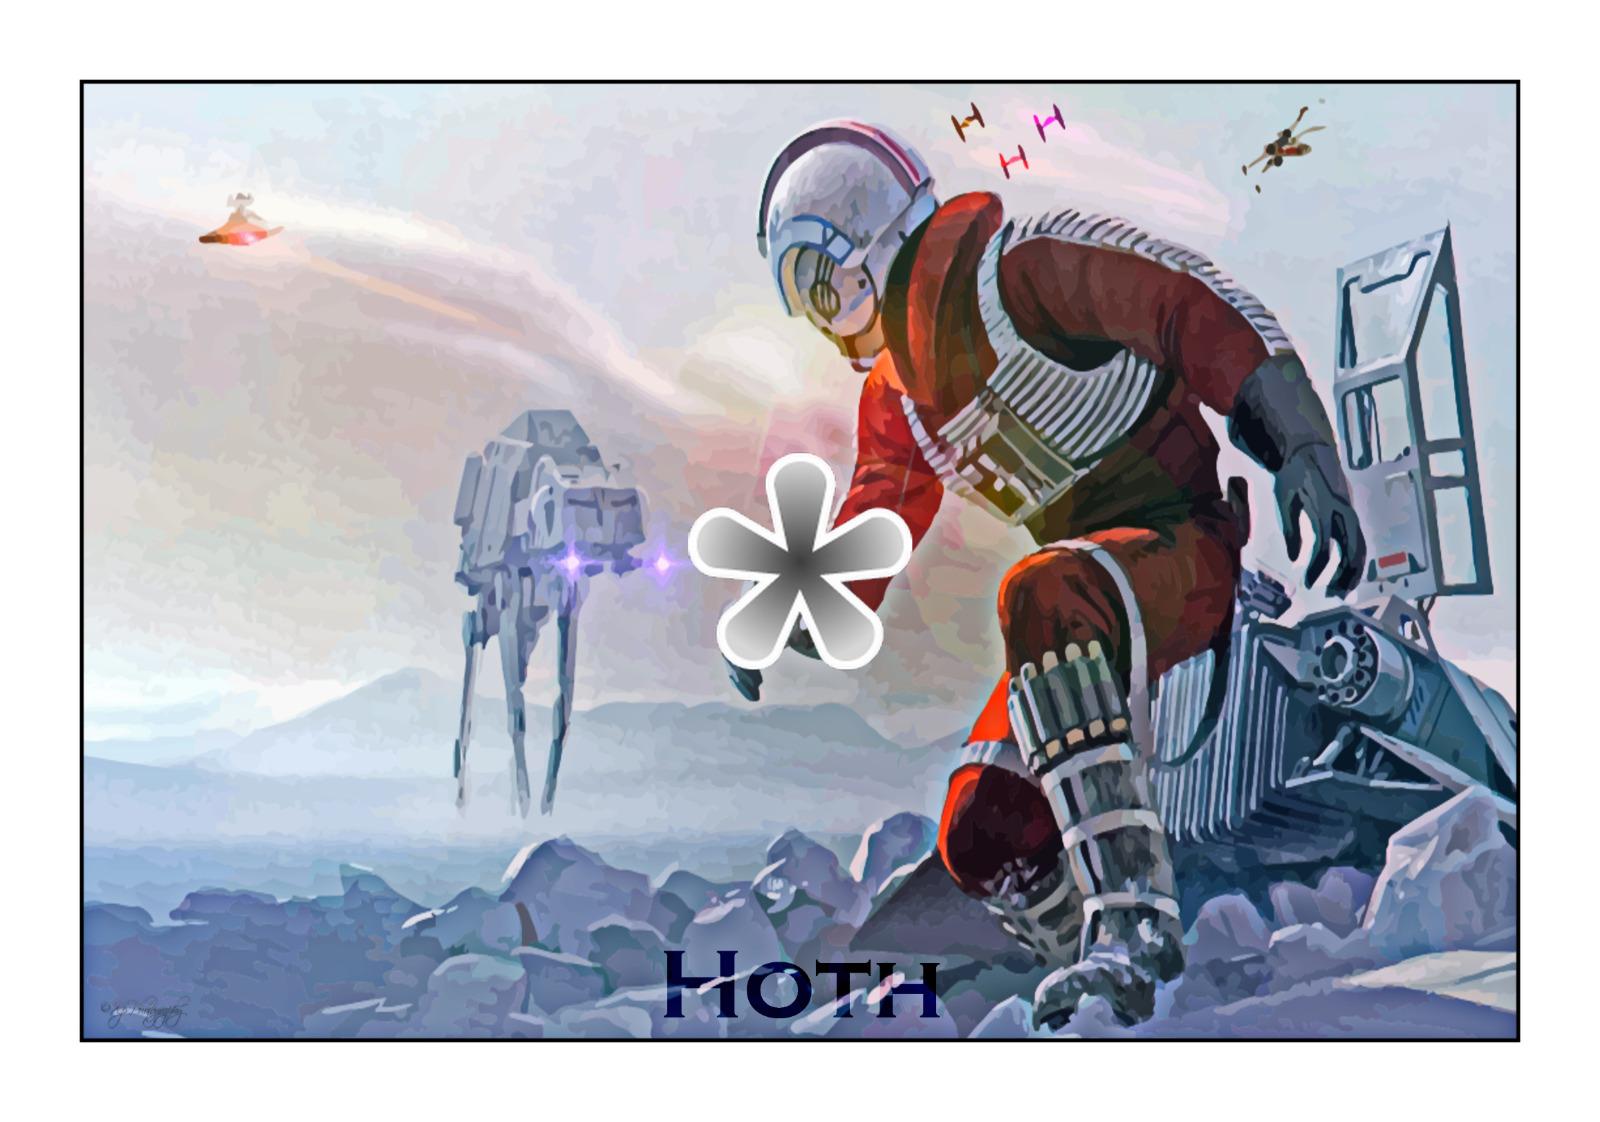 StarWars Planet Hoth